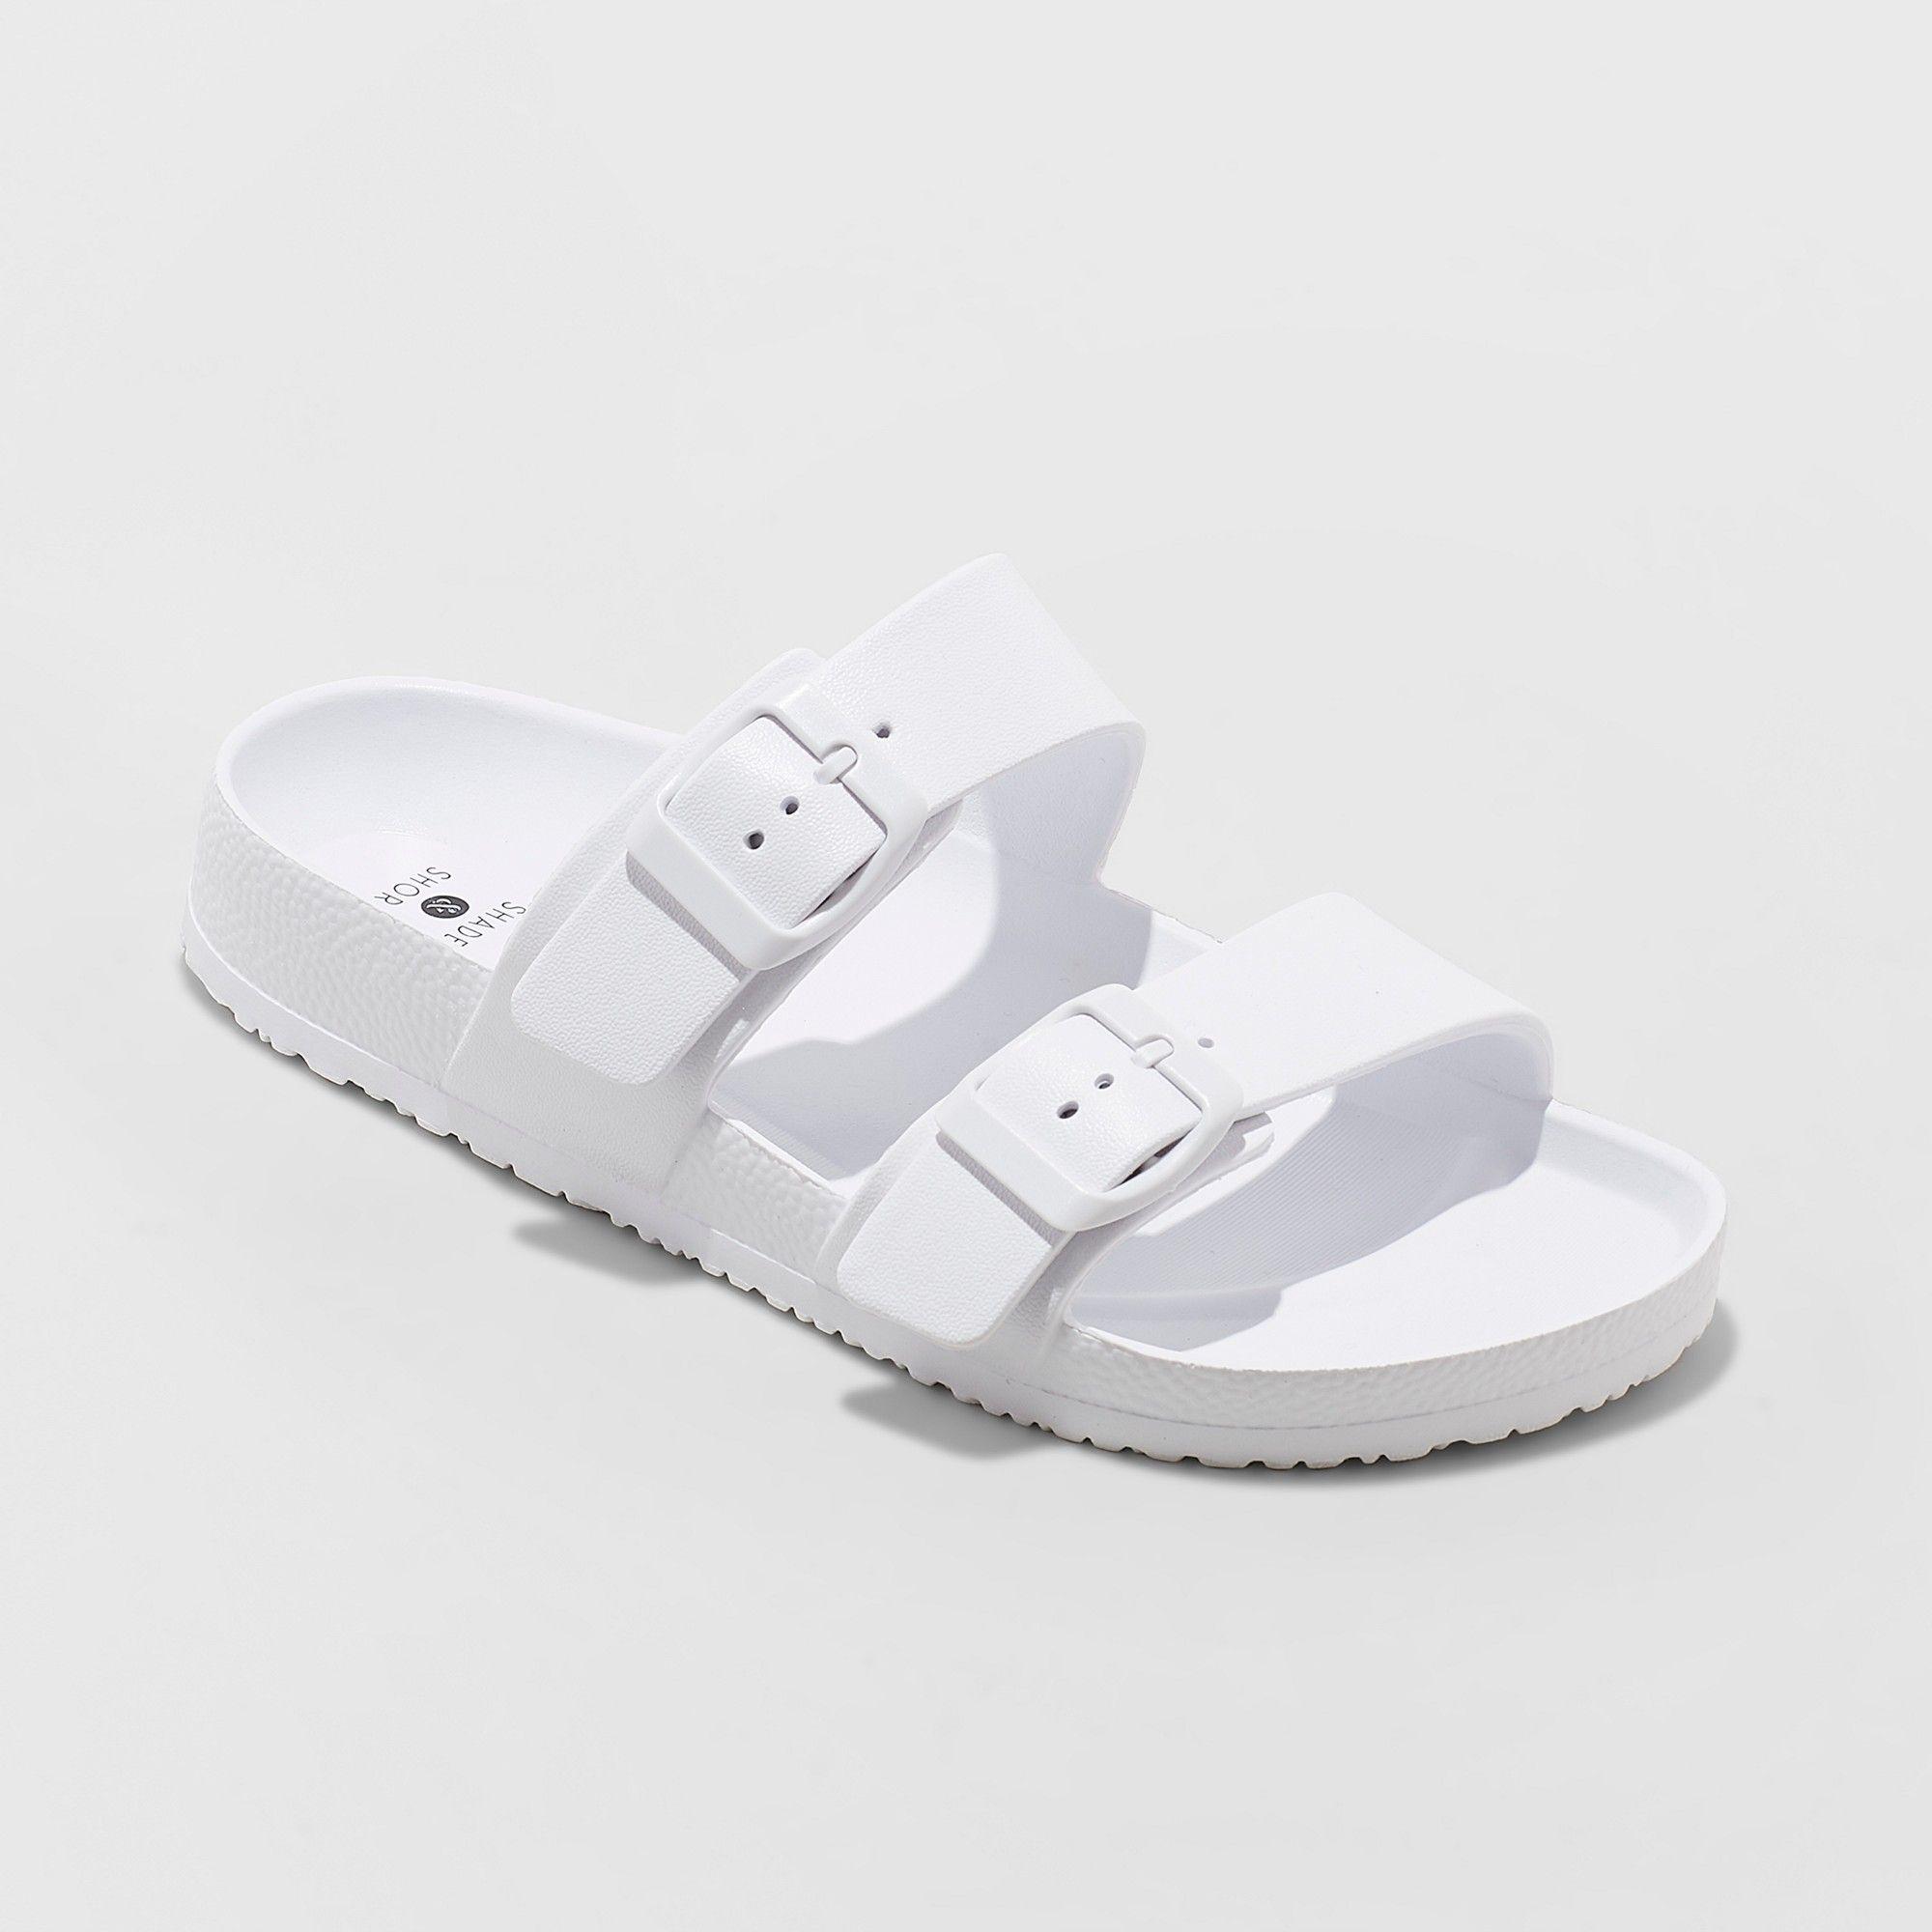 96a3d5a43ef Women s Neida Wide Width Eva Two Band Flip Flop Slide Sandals - Shade    Shore White 11W